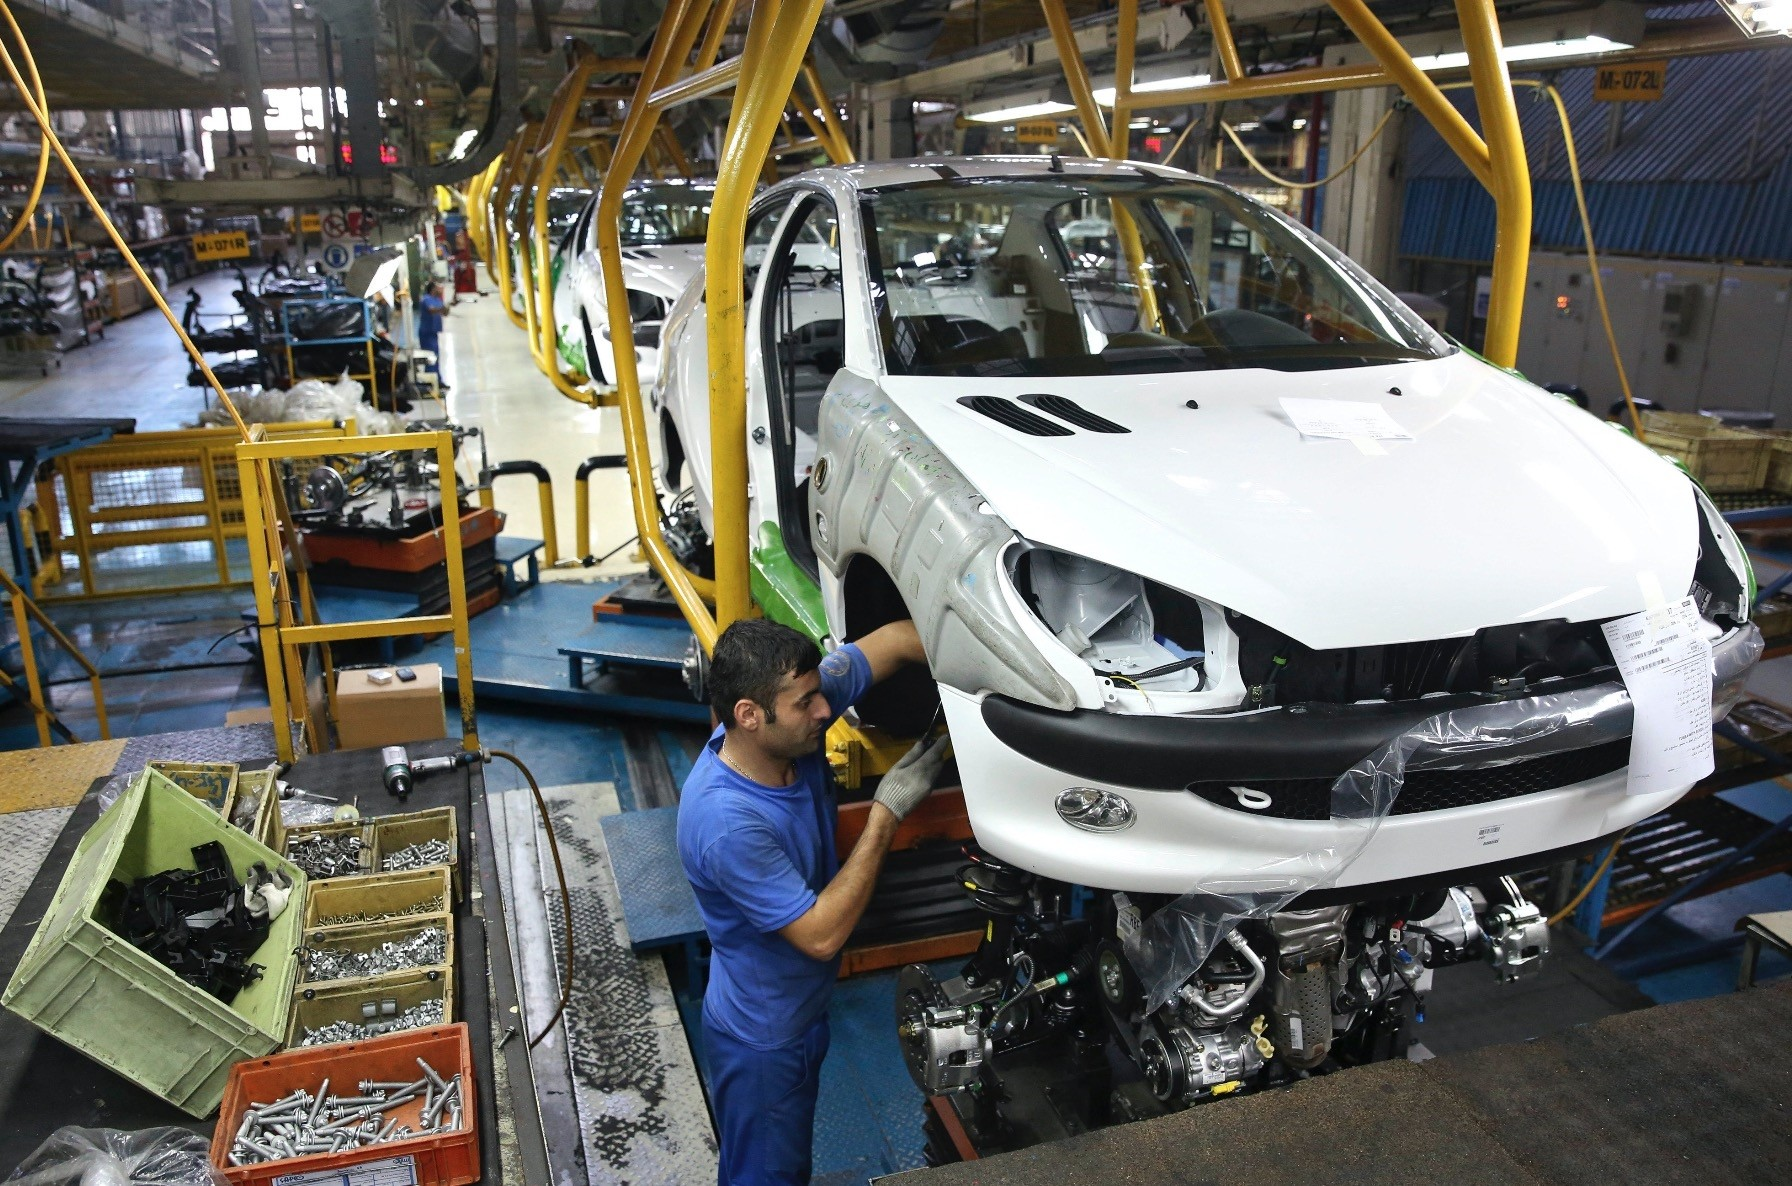 An Iranian worker assembles a Peugeot 206 at the state-run Iran-Khodro automobile manufacturing plant, Tehran, Iran.